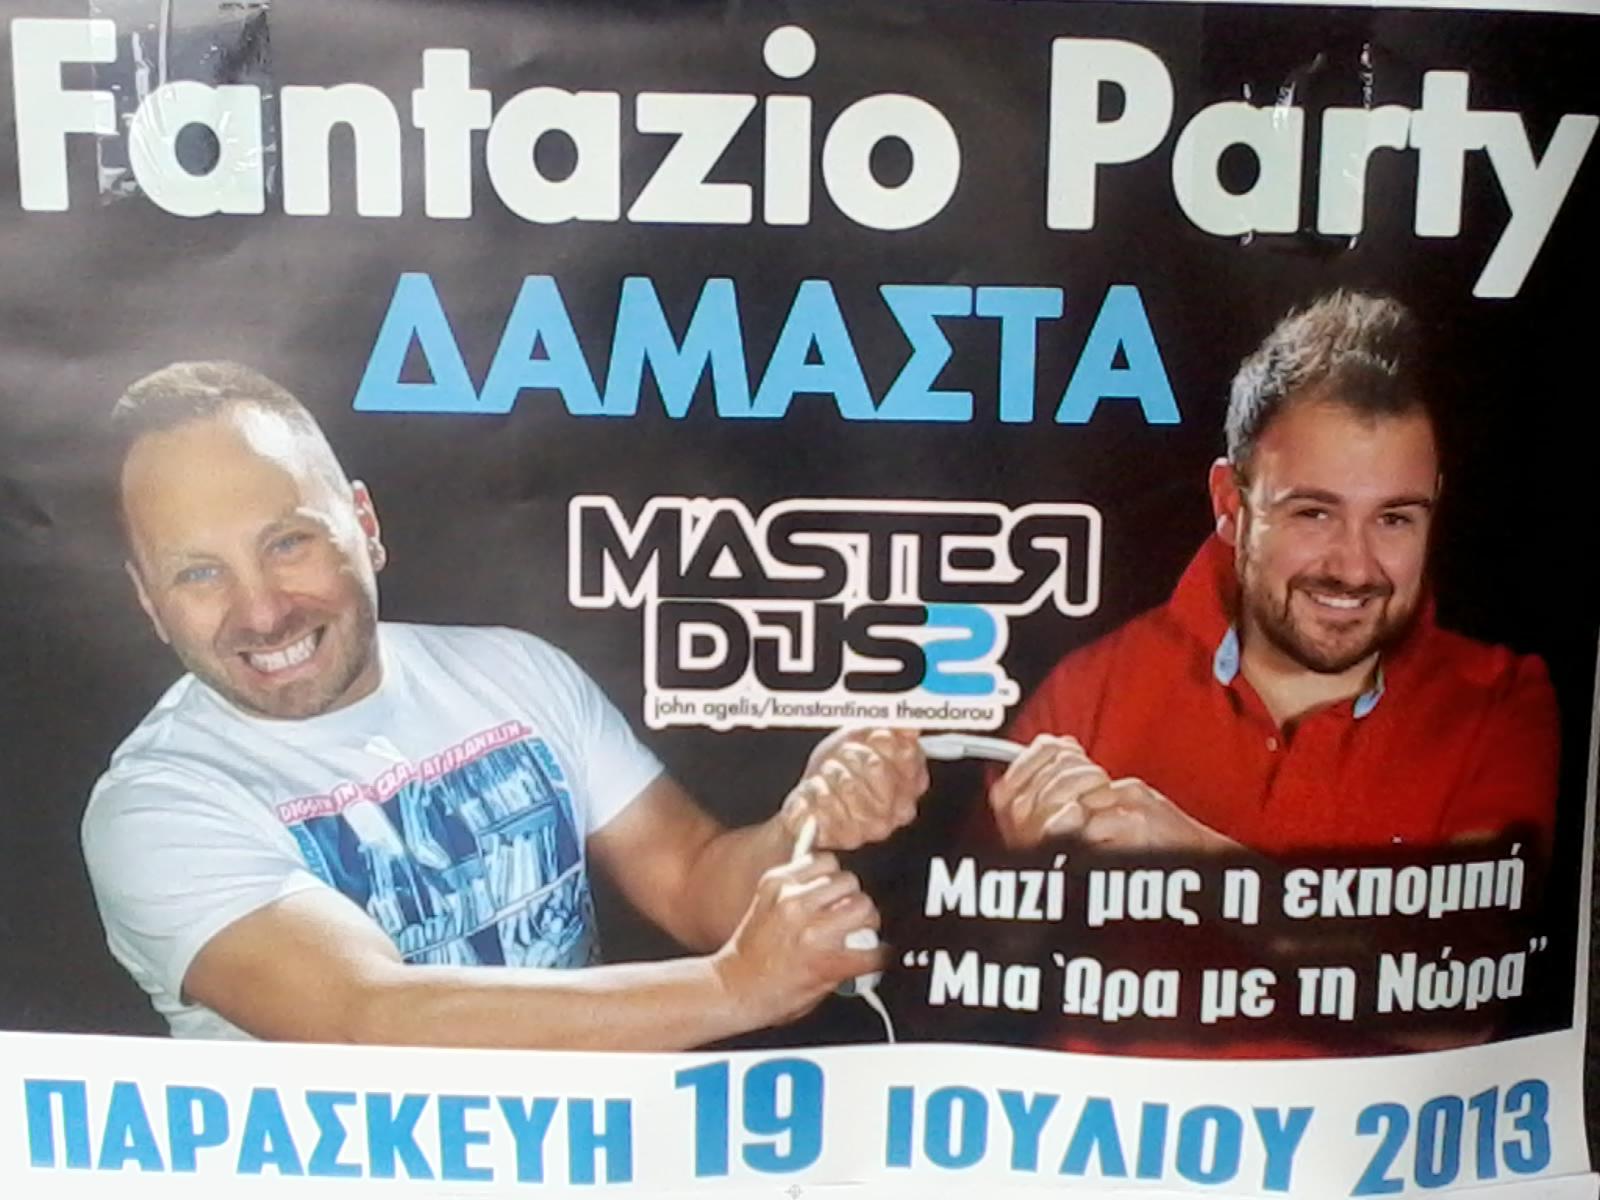 summer party damastas 2013  audio-m